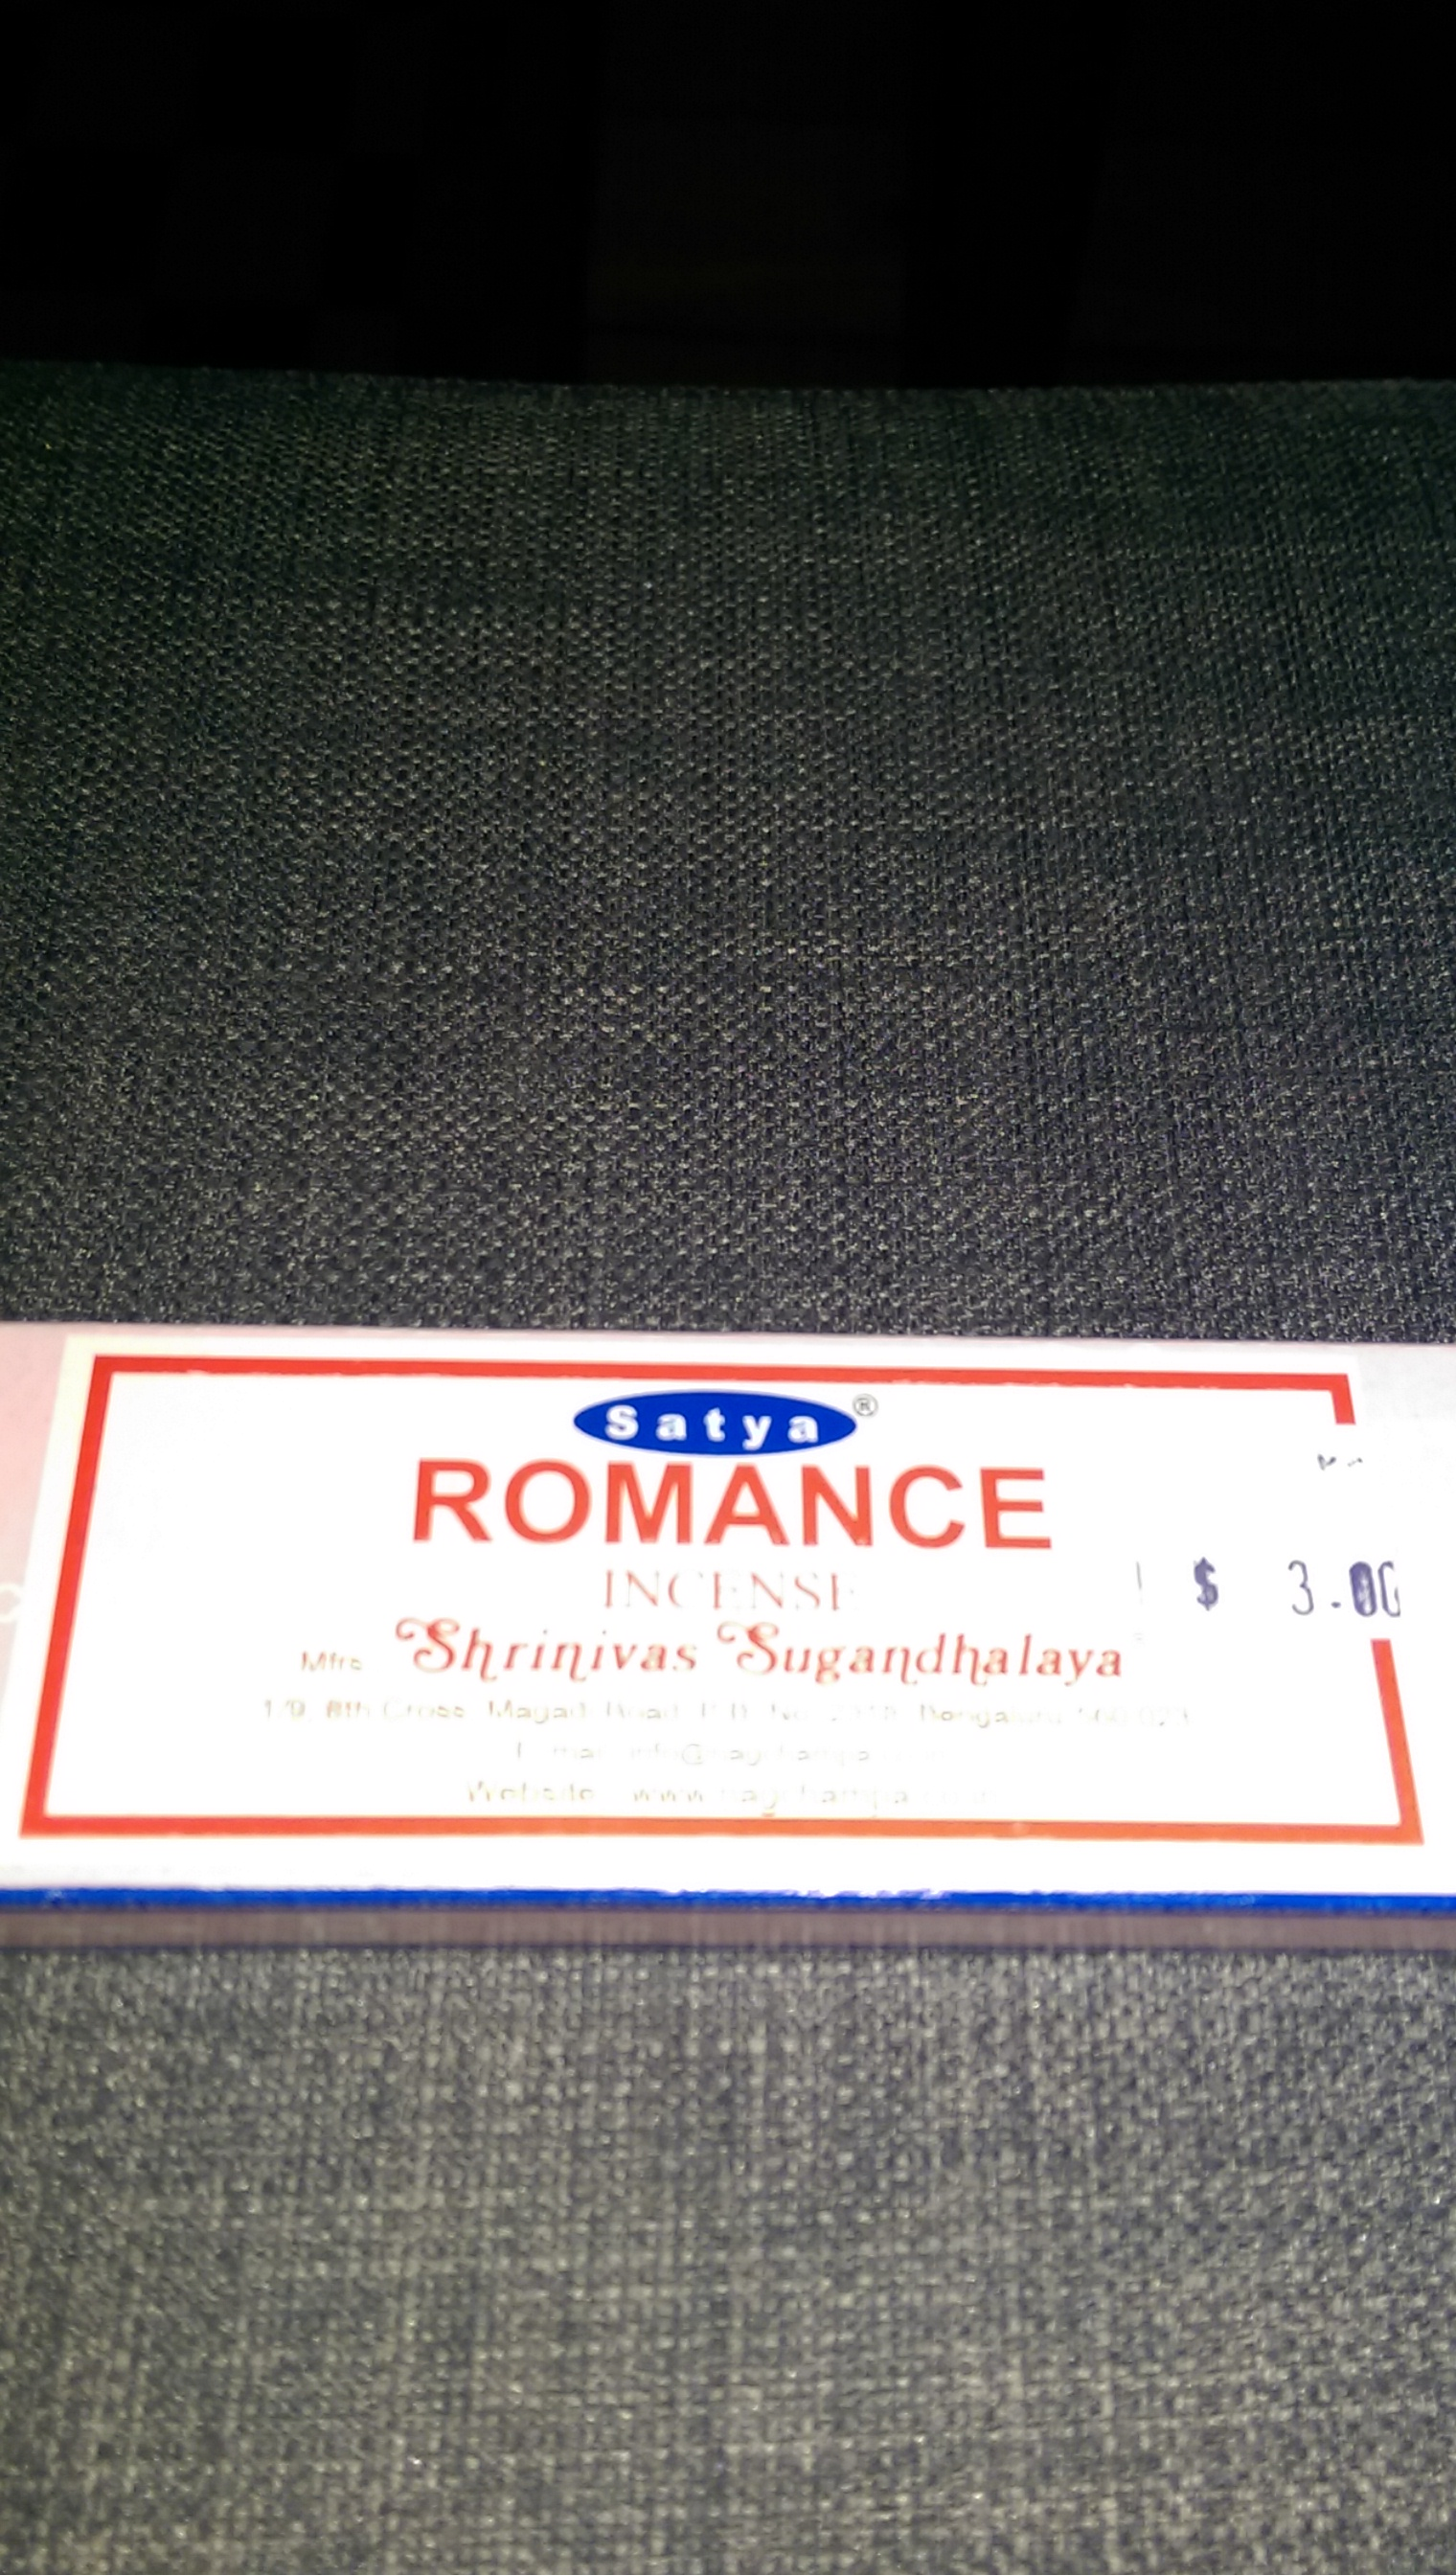 Romance Incense